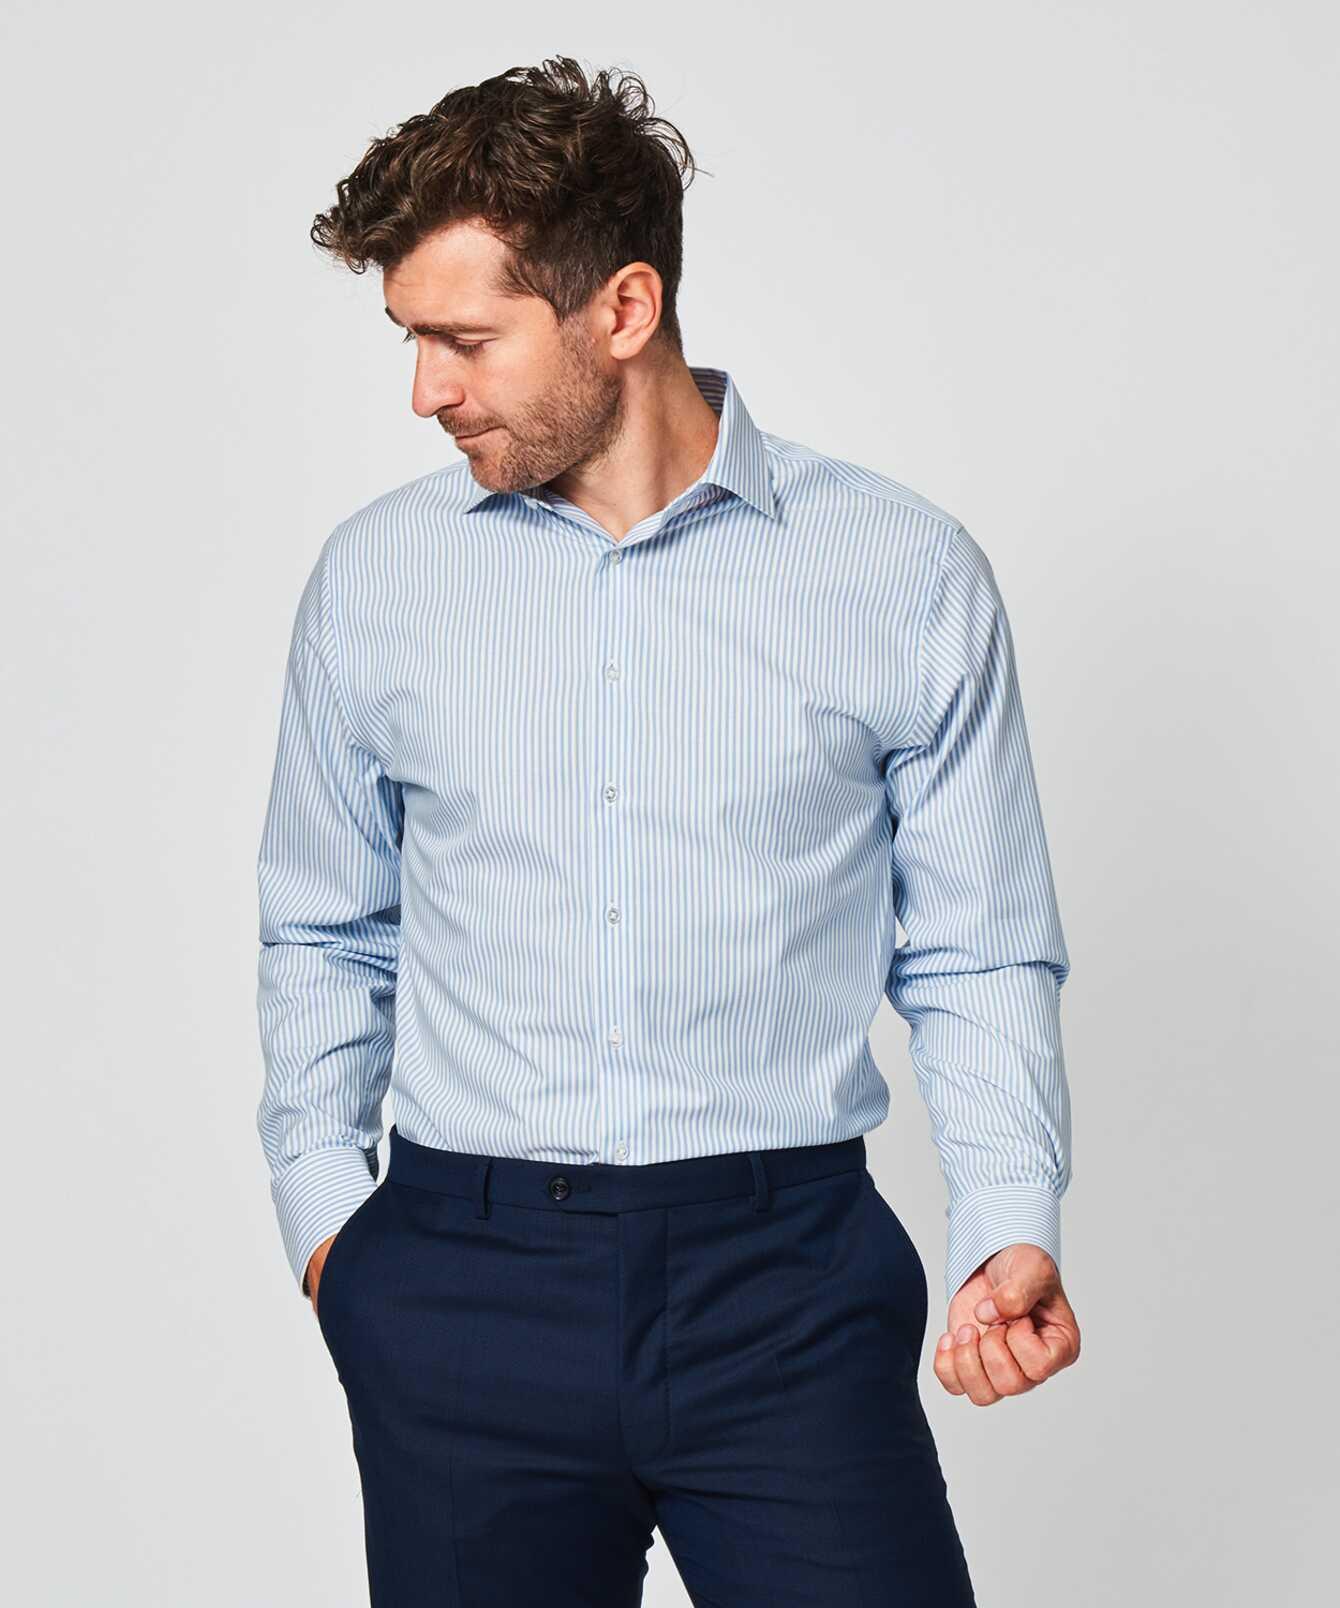 Skjorta Stripe Lättstruken The Shirt Factory